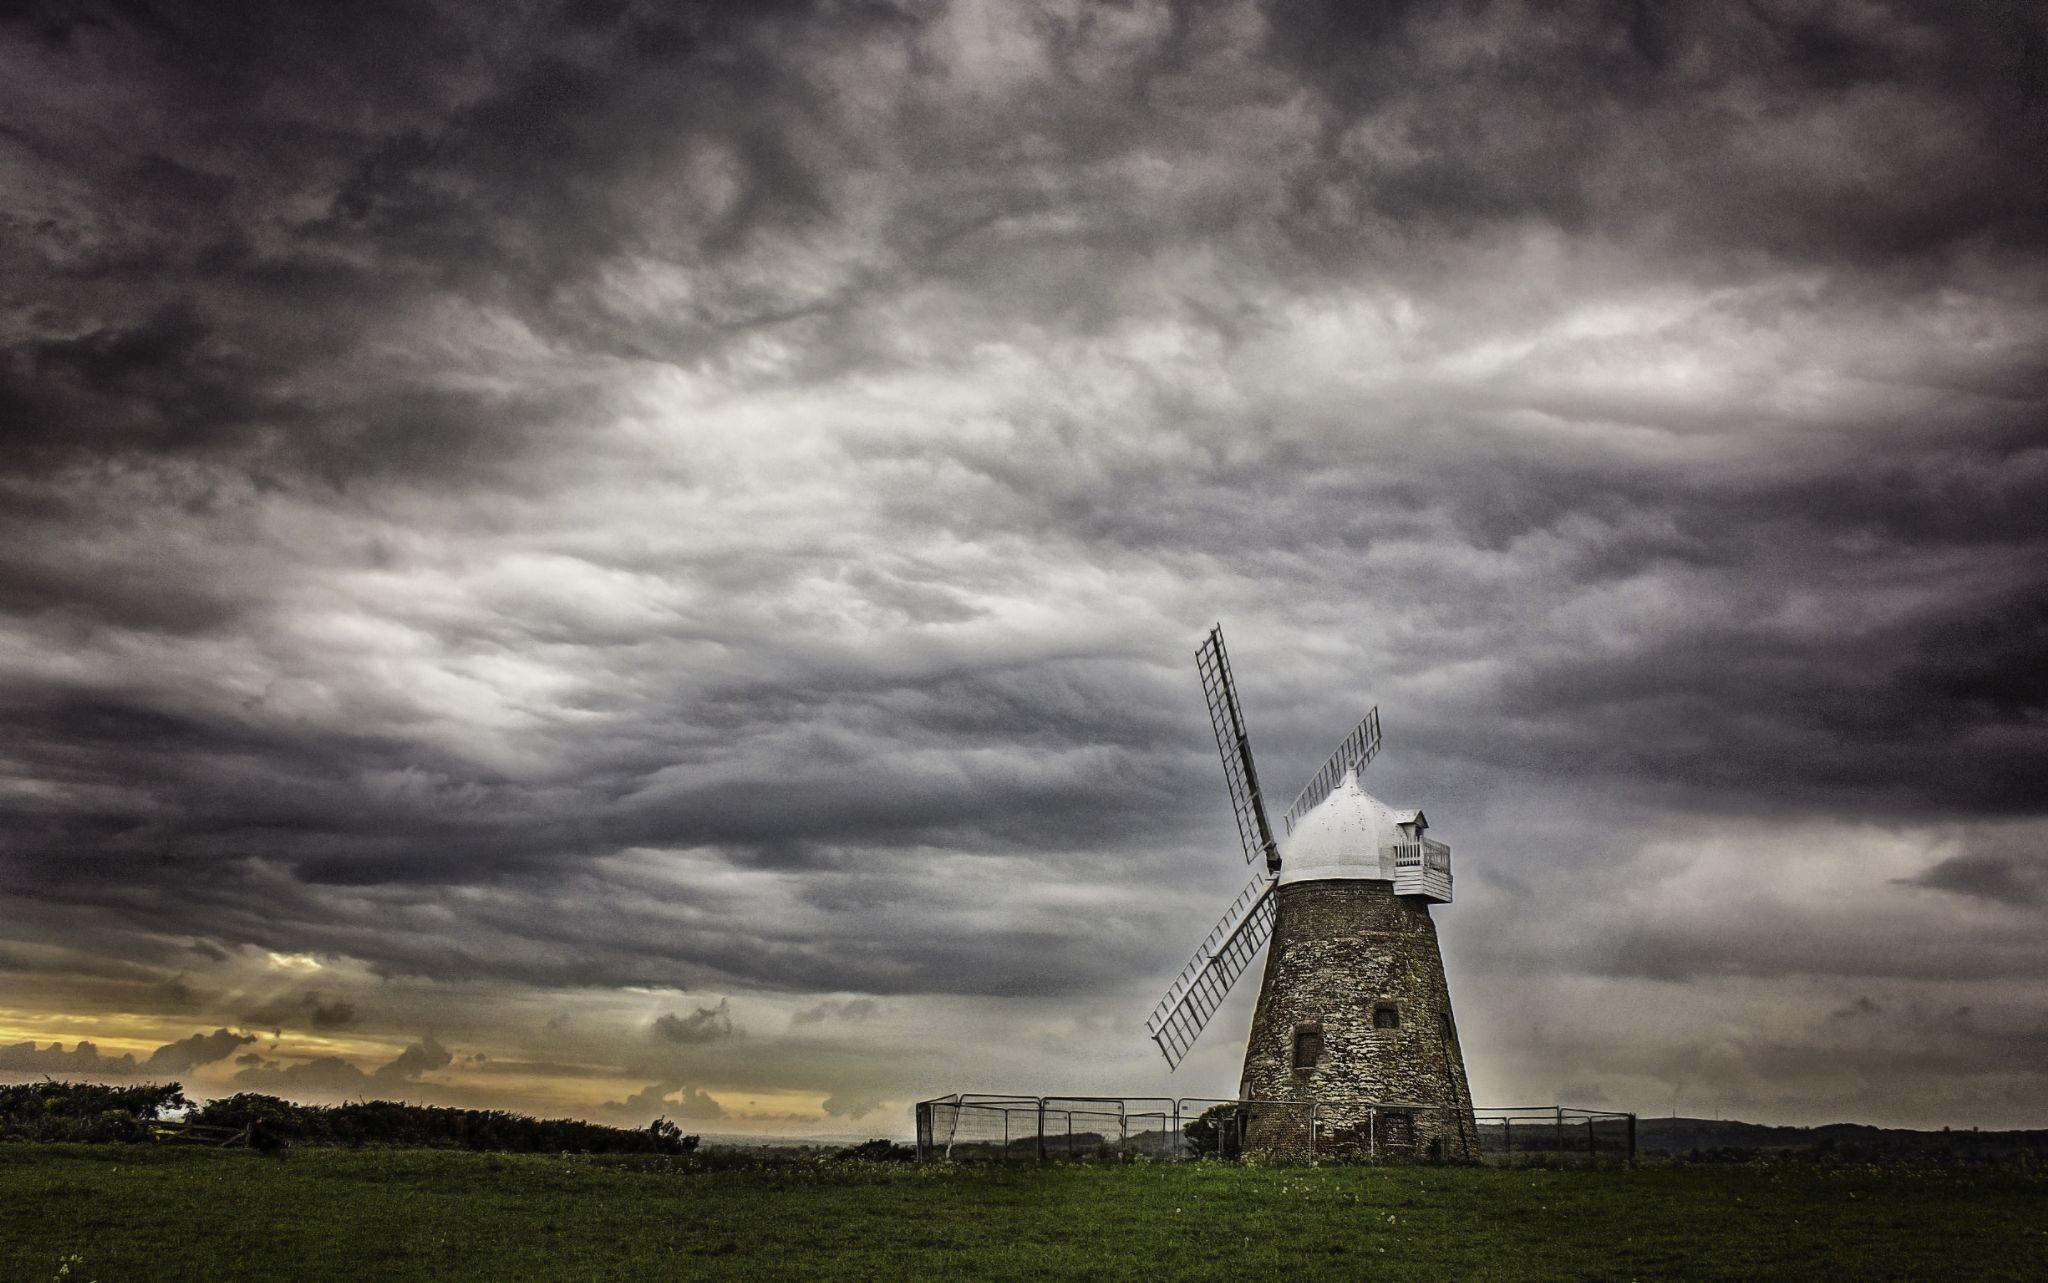 Halnaker Windmill by tonyrabina